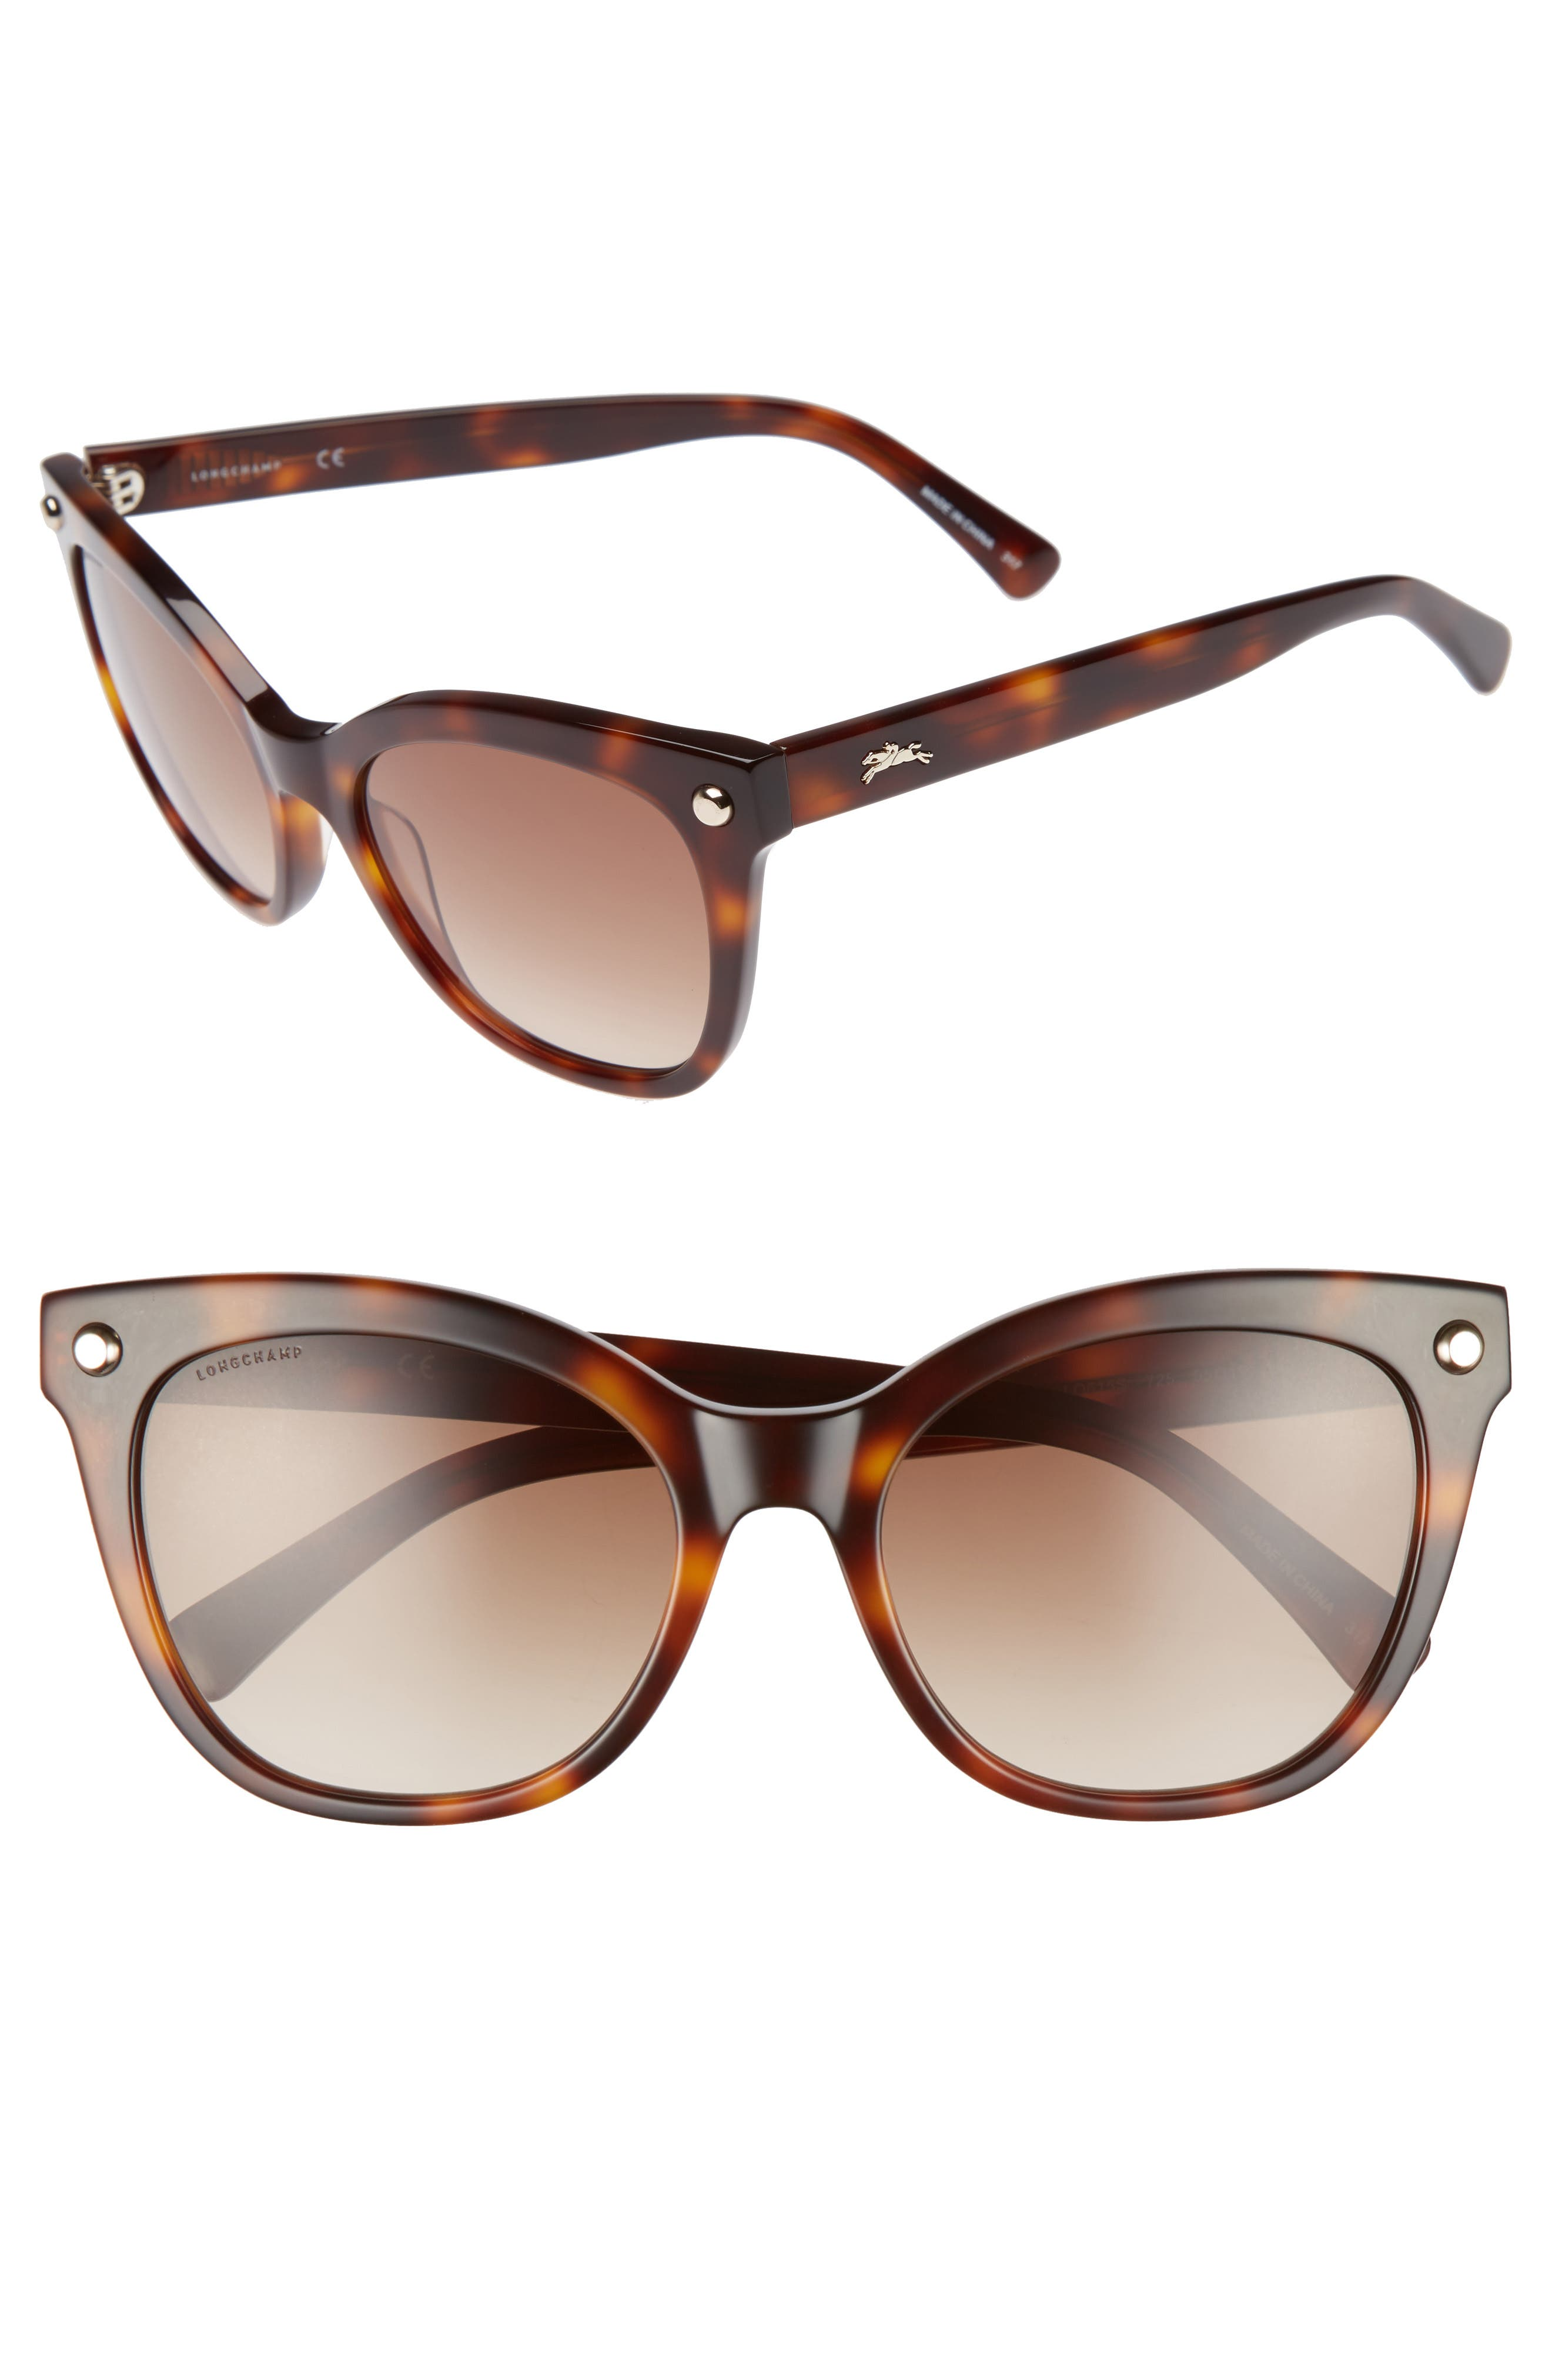 55mm Cat Eye Sunglasses,                             Main thumbnail 1, color,                             Blonde Havana